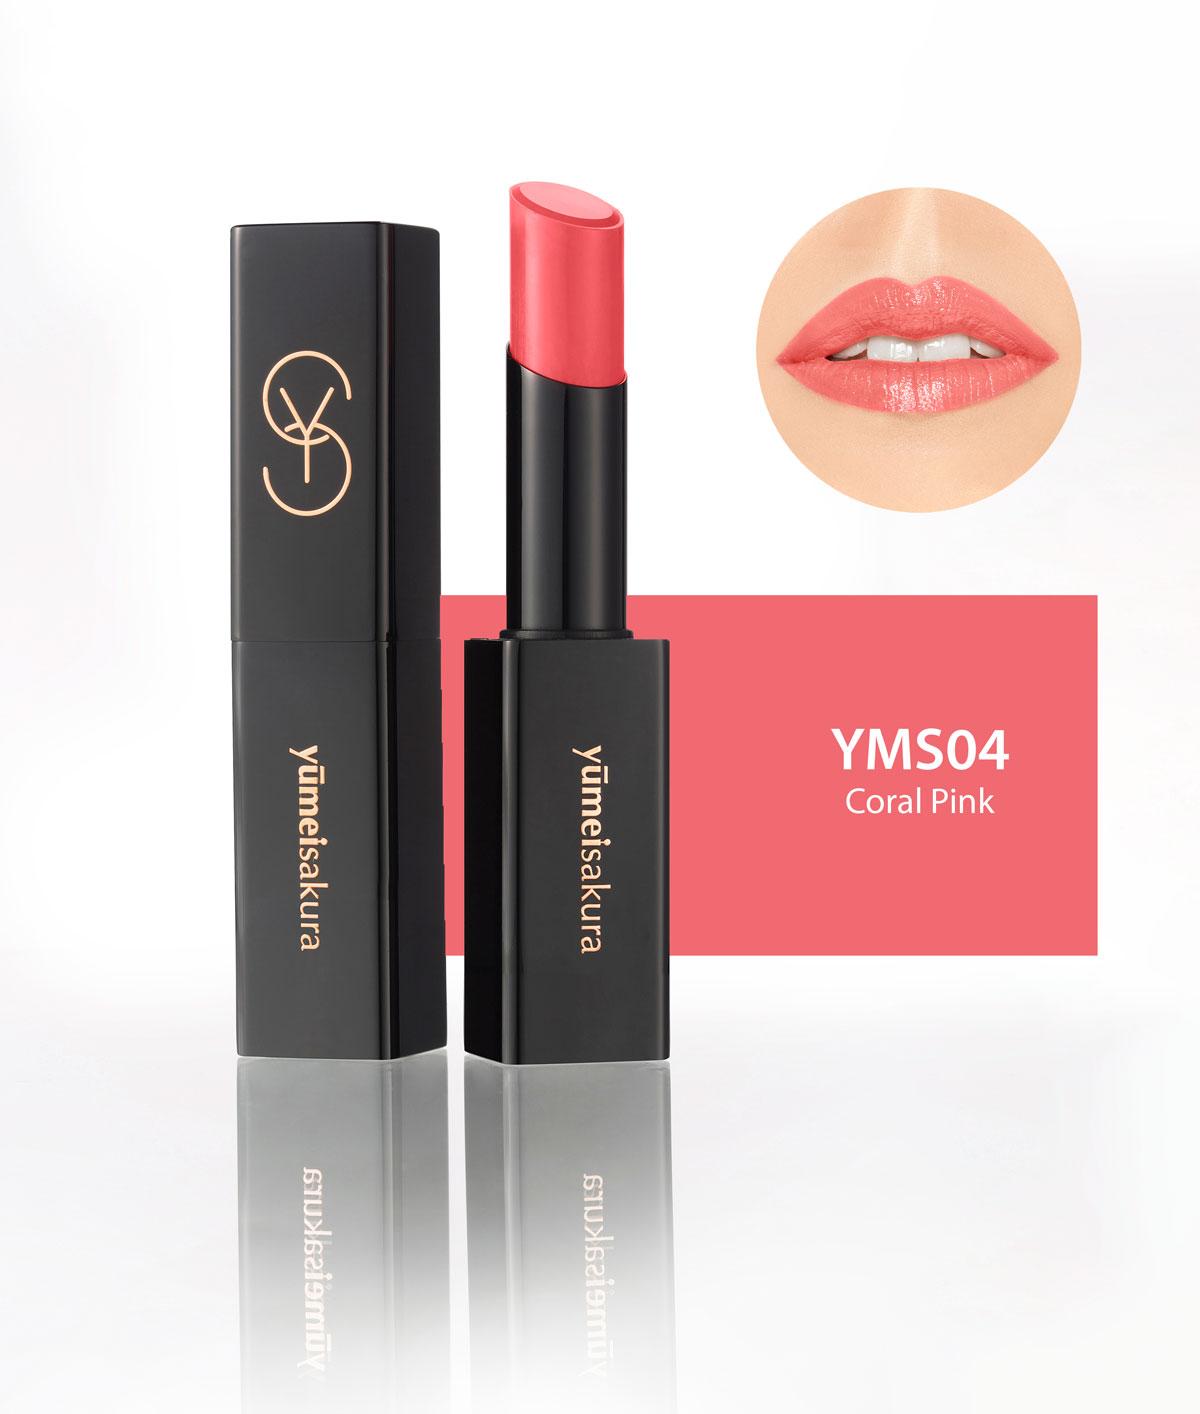 YMS04 - Coral Pink